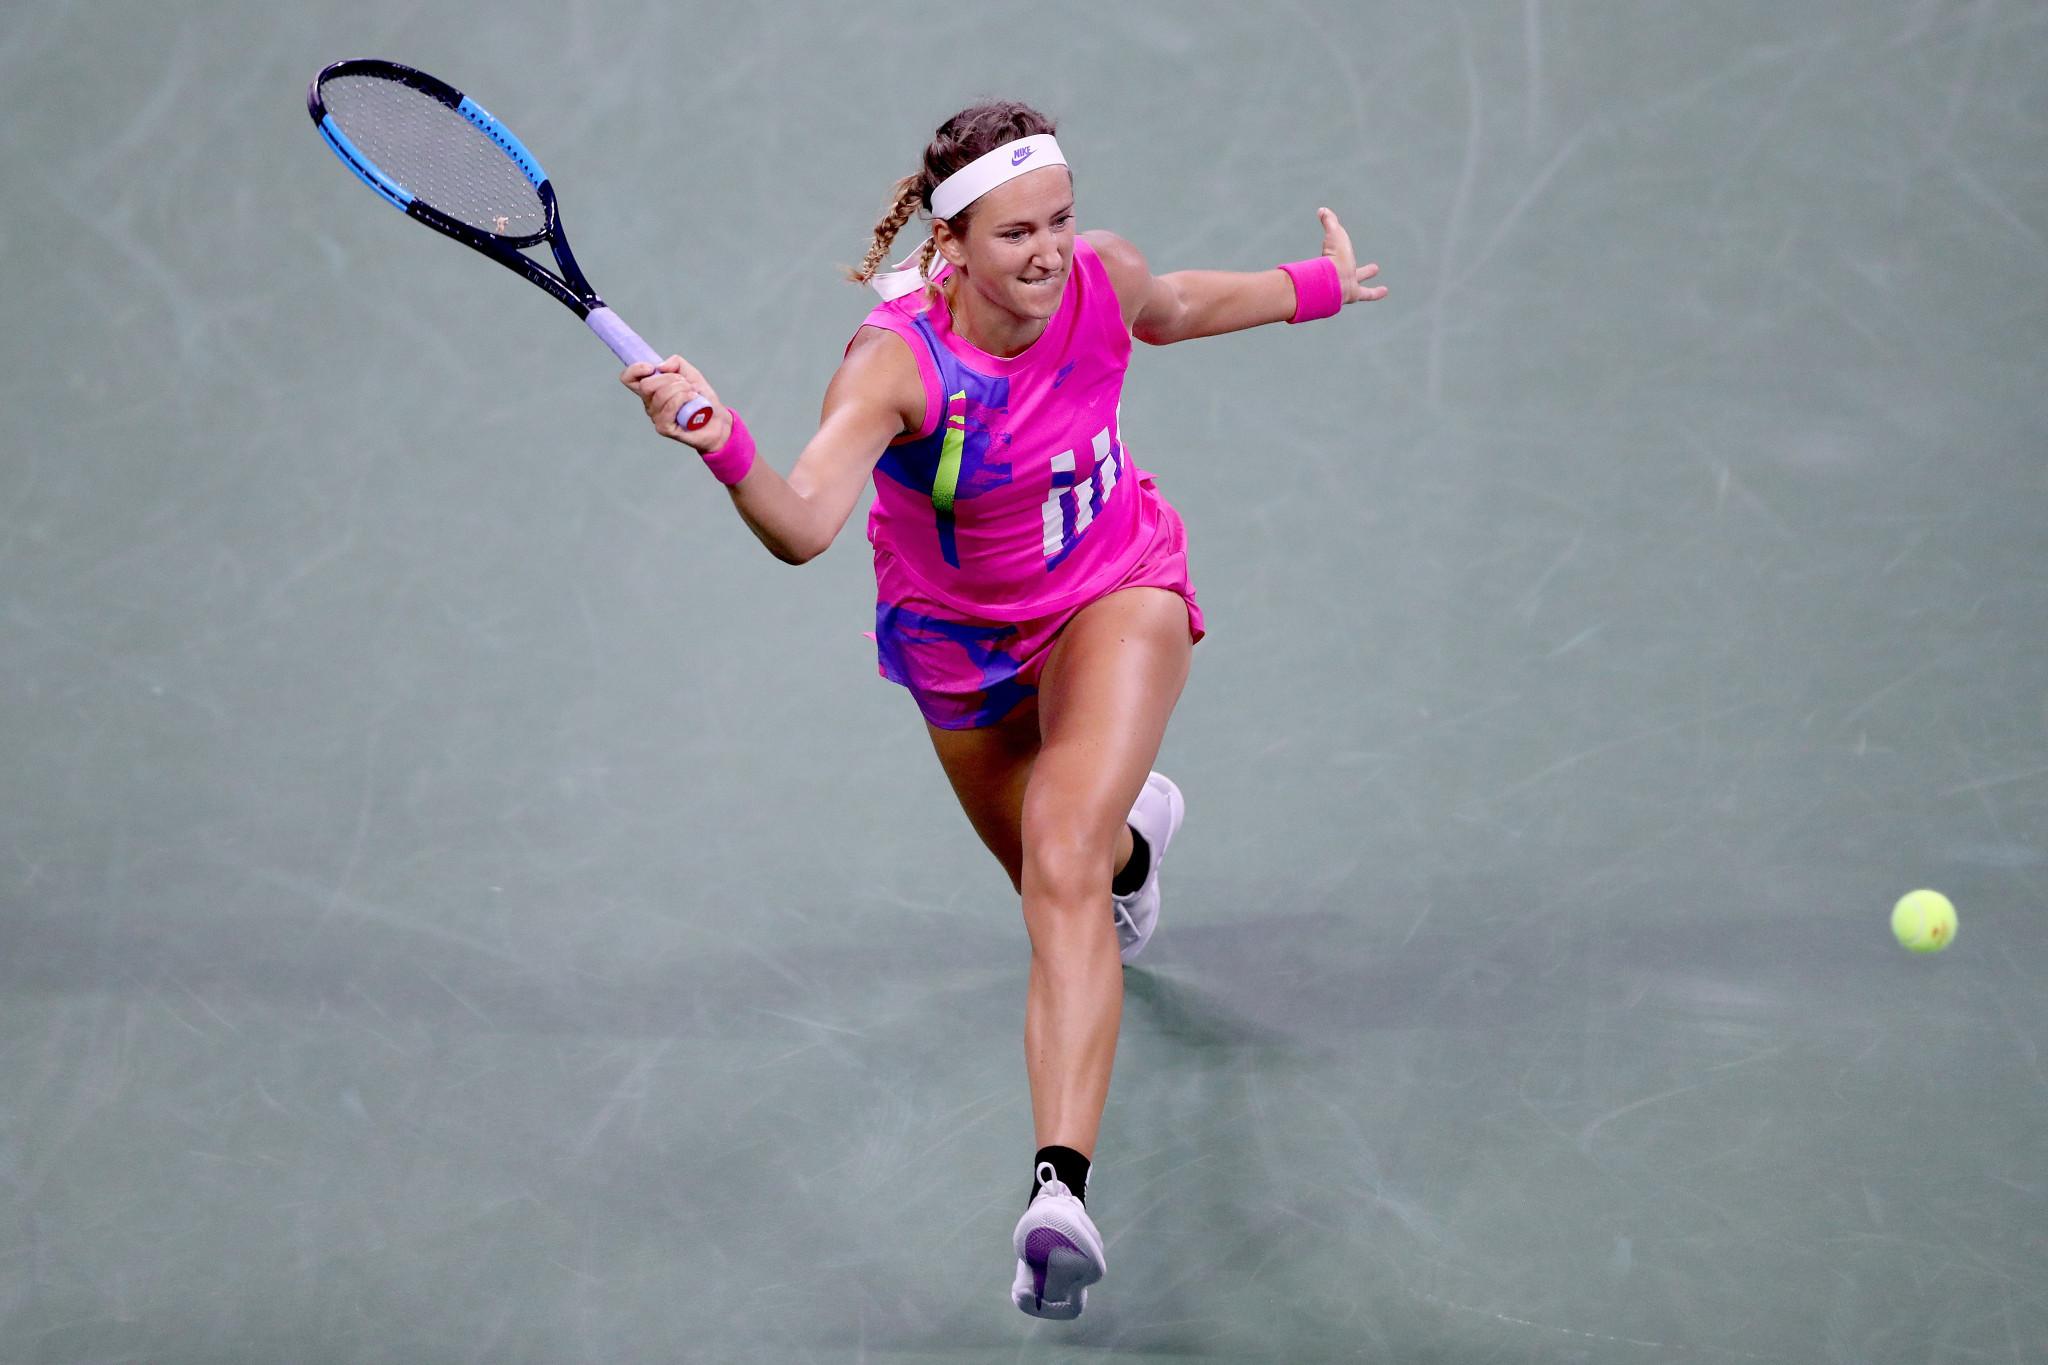 Victoria Azarenka has made her first Grand Slam quarter-final since the 2016 Australian Open ©Getty Images